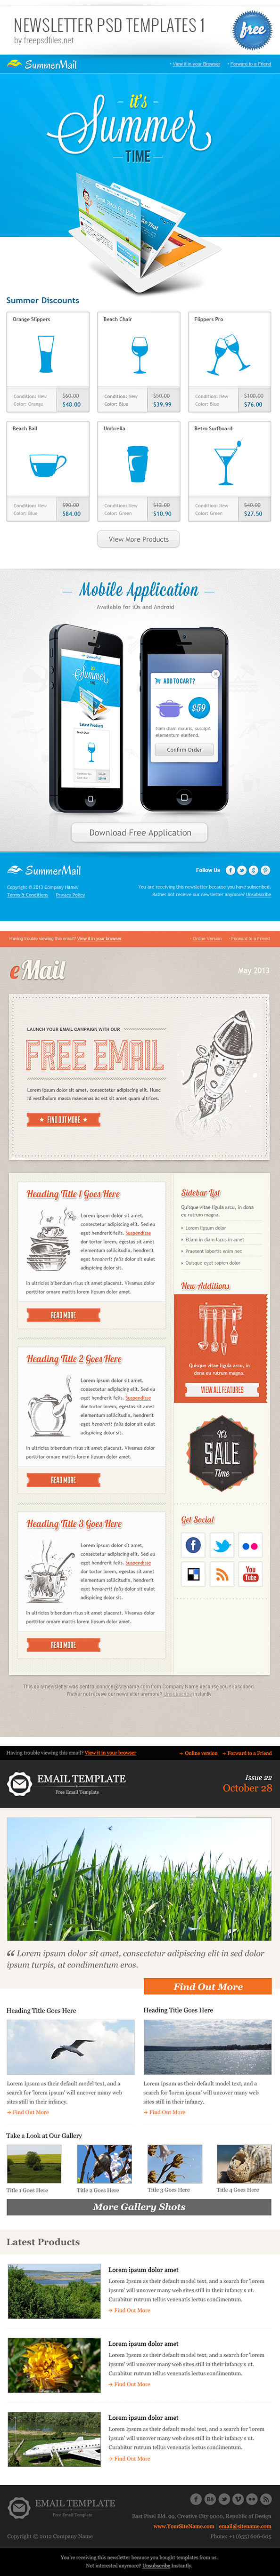 Newsletter psd template set 1 free psd files spiritdancerdesigns Choice Image